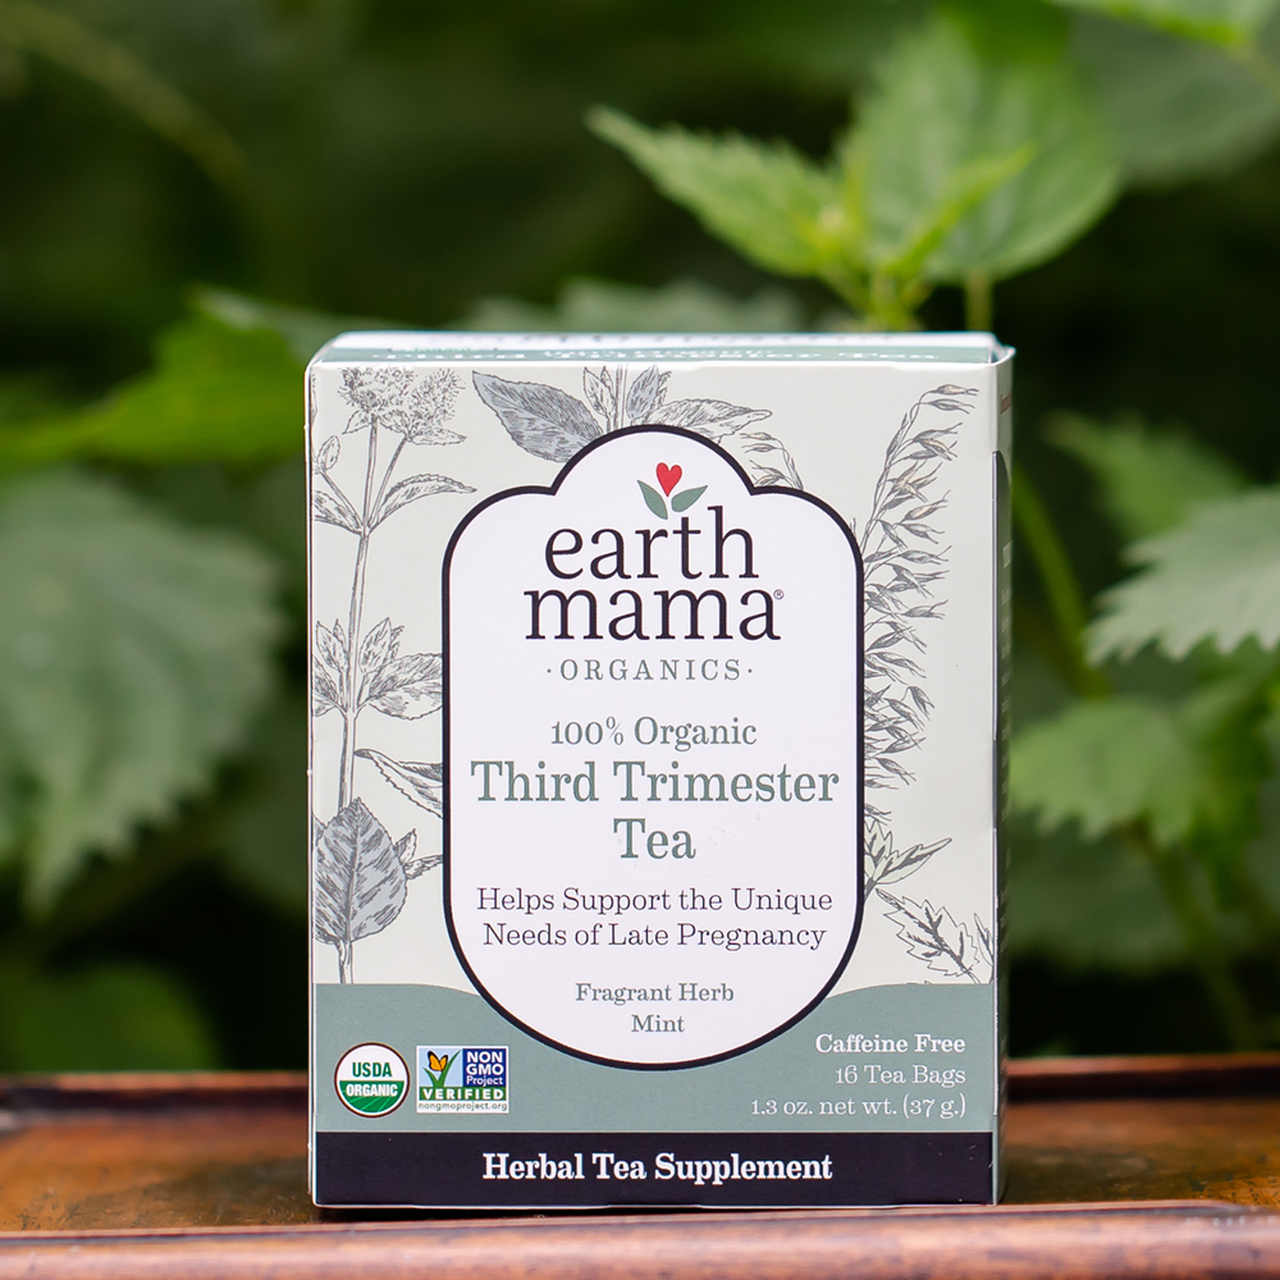 earth-mama-organic-third-trimester-tea-2